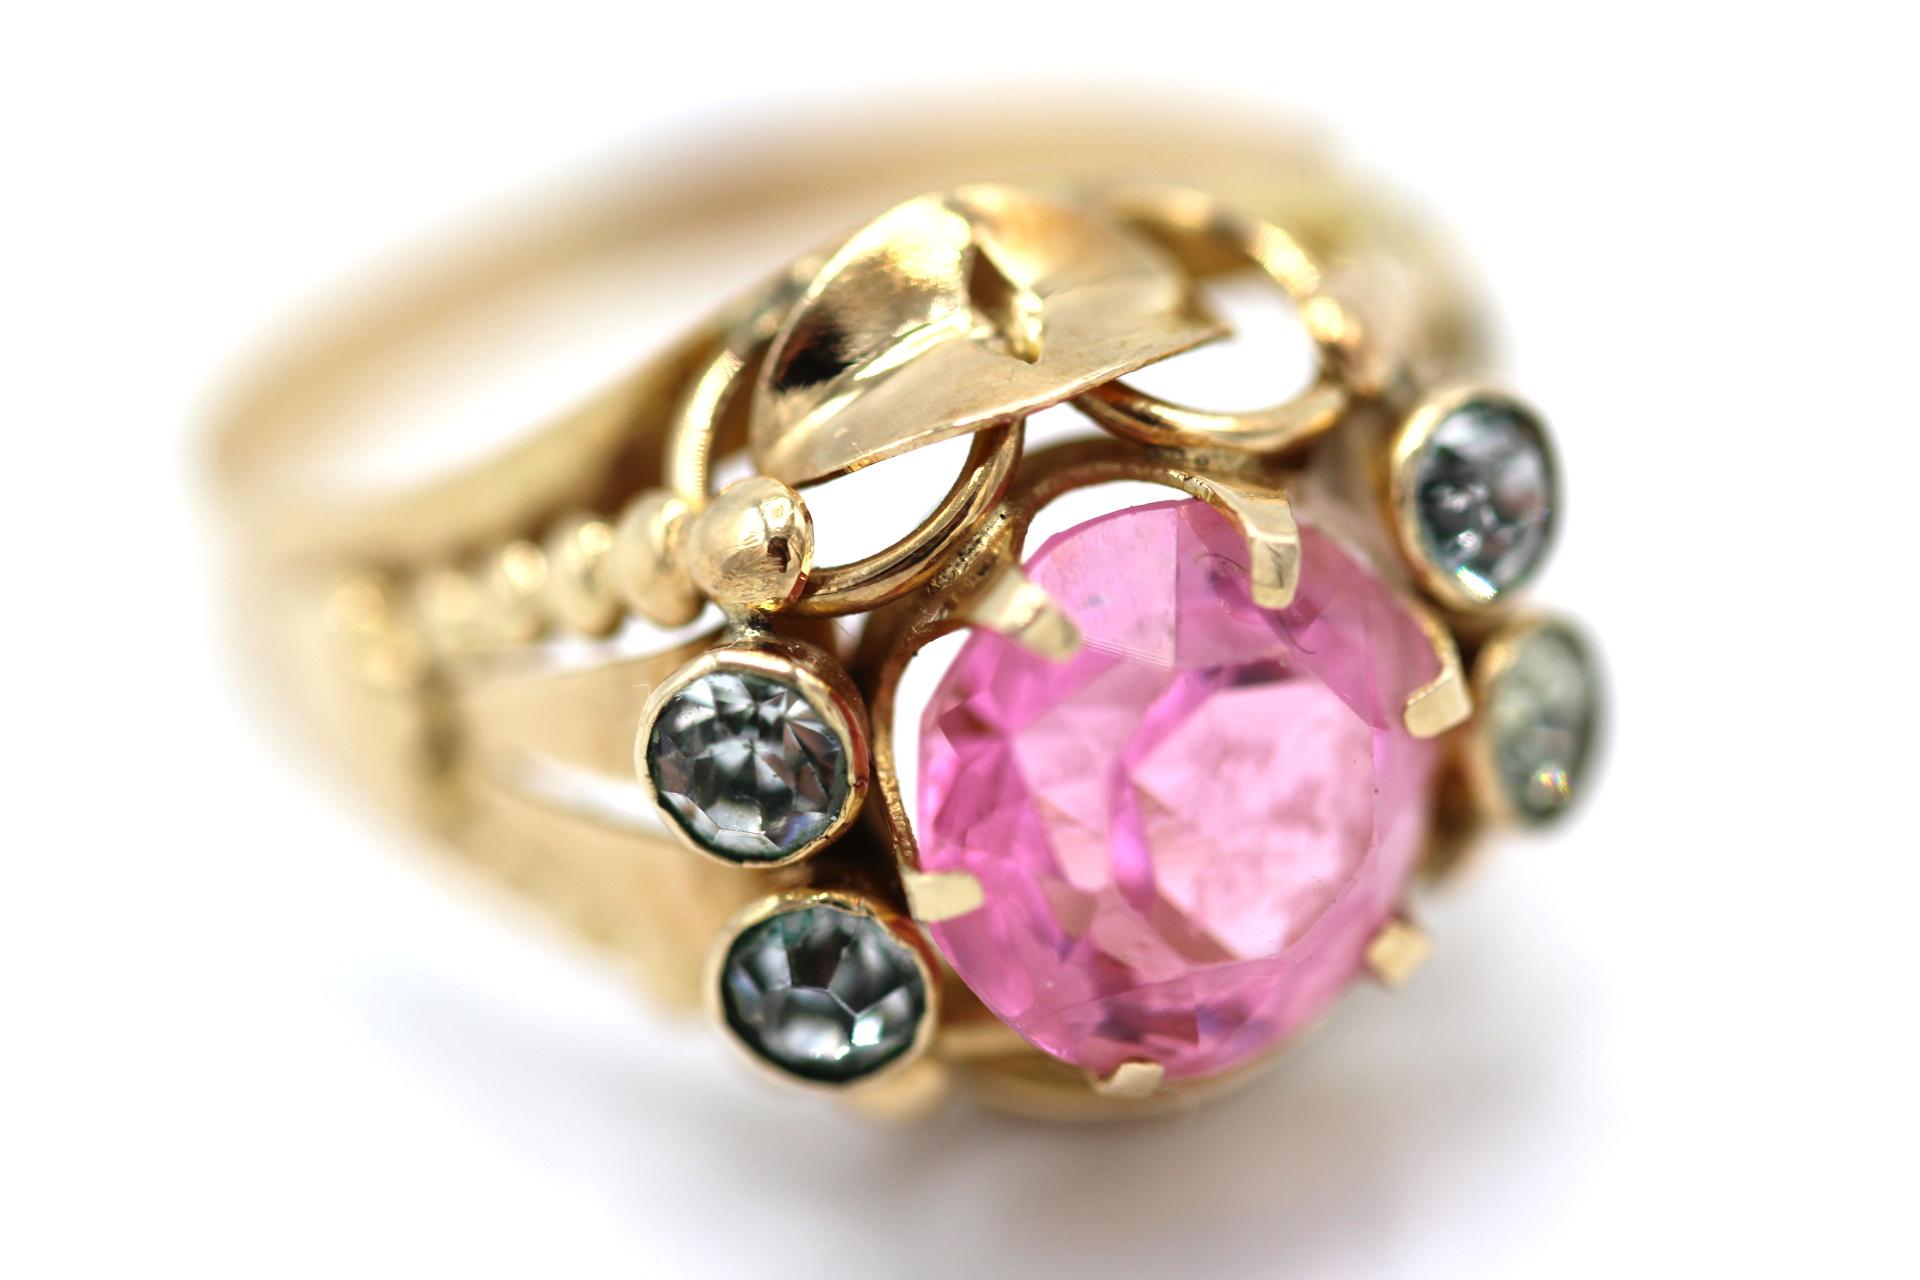 panzerkette gold juwelier versteigerung juwelen saphir smaragd brilliantschmuck ankauf